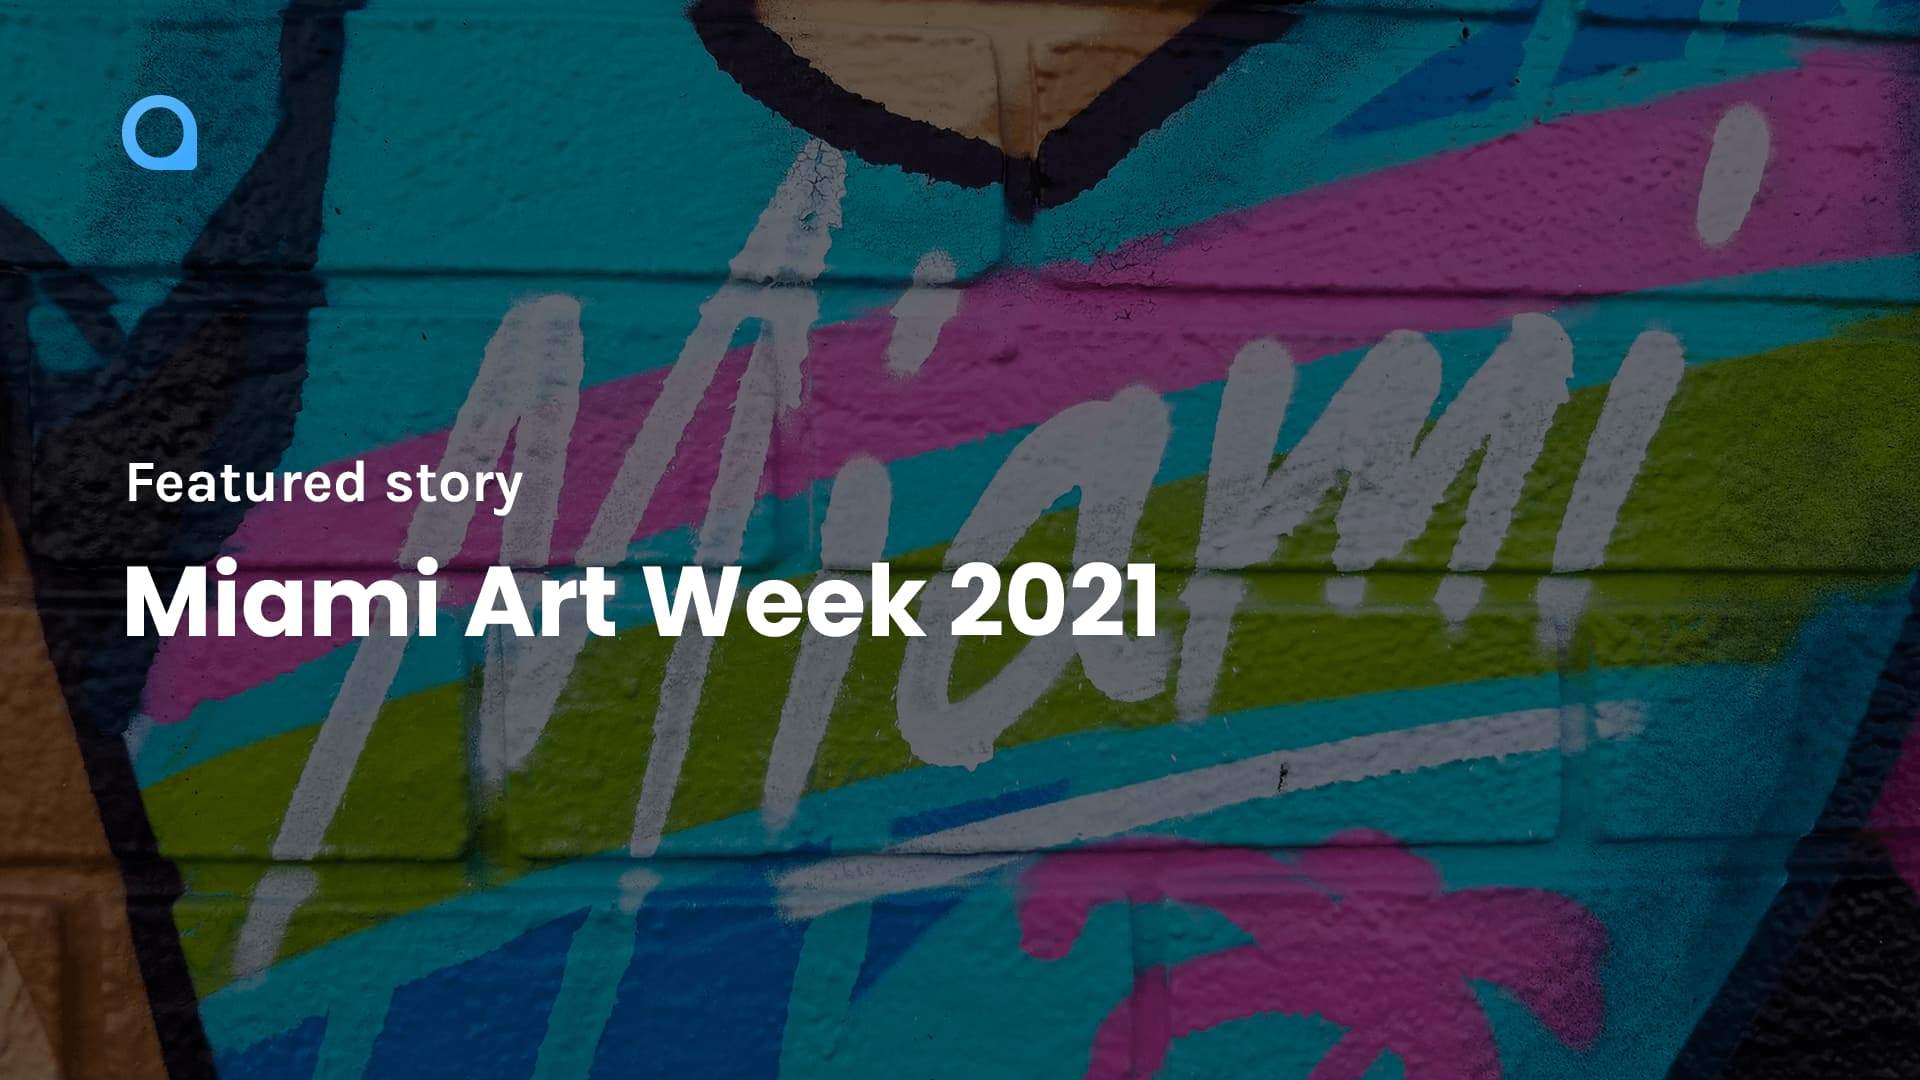 Miami Art Week 2021